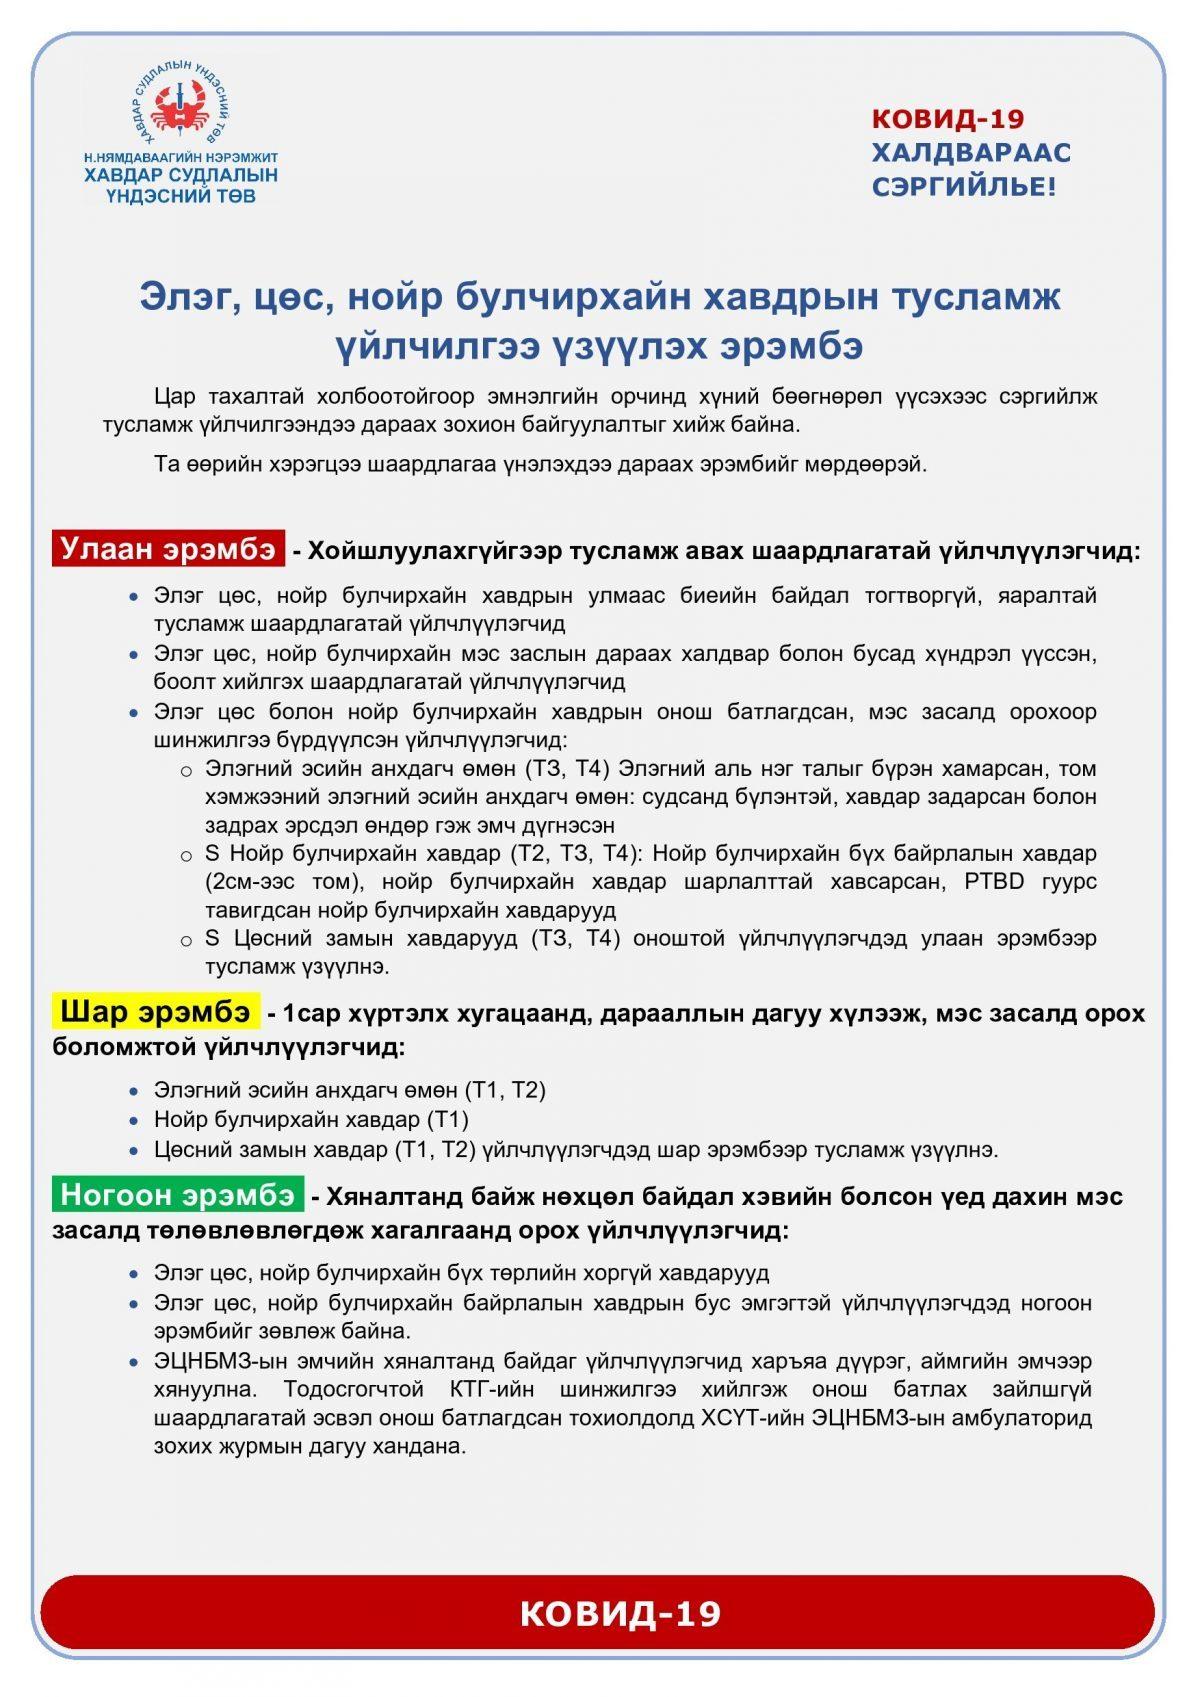 erembe-page0001-e1610174568869-1200x1697.jpg